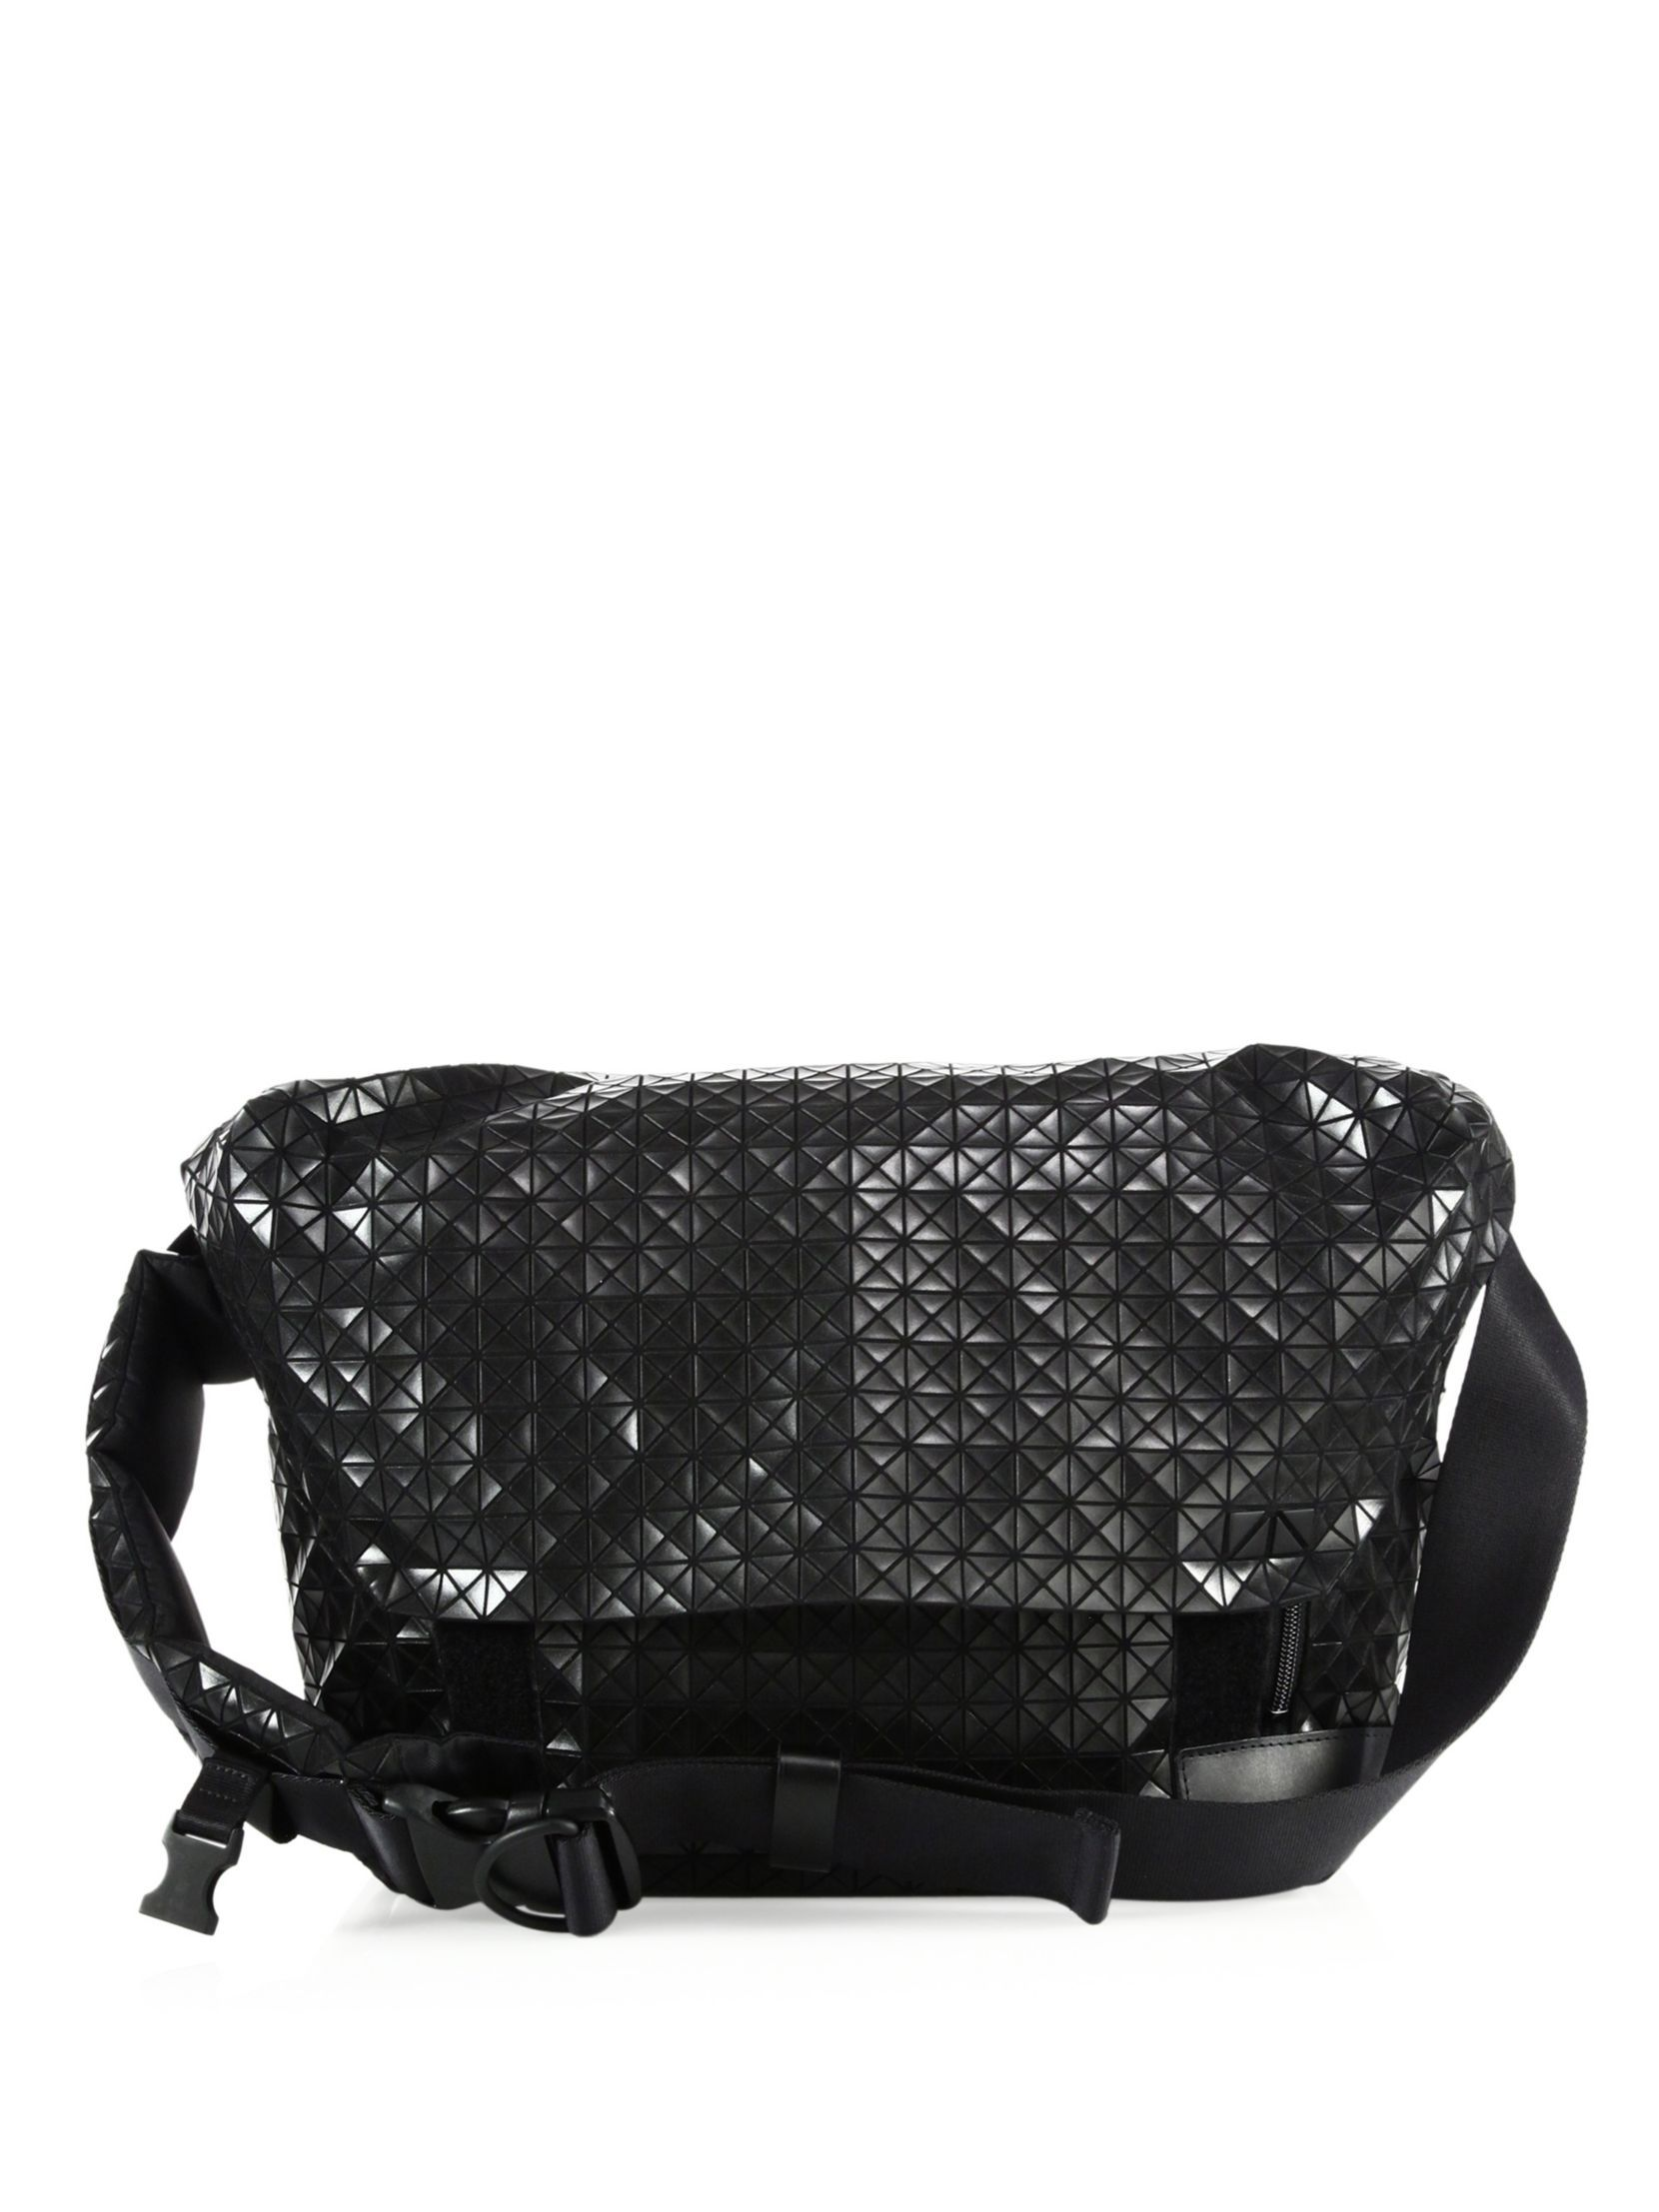 Bao Bao Issey Miyake Geometric Paneled Rider Messenger Bag   Bags 19339a6fd0